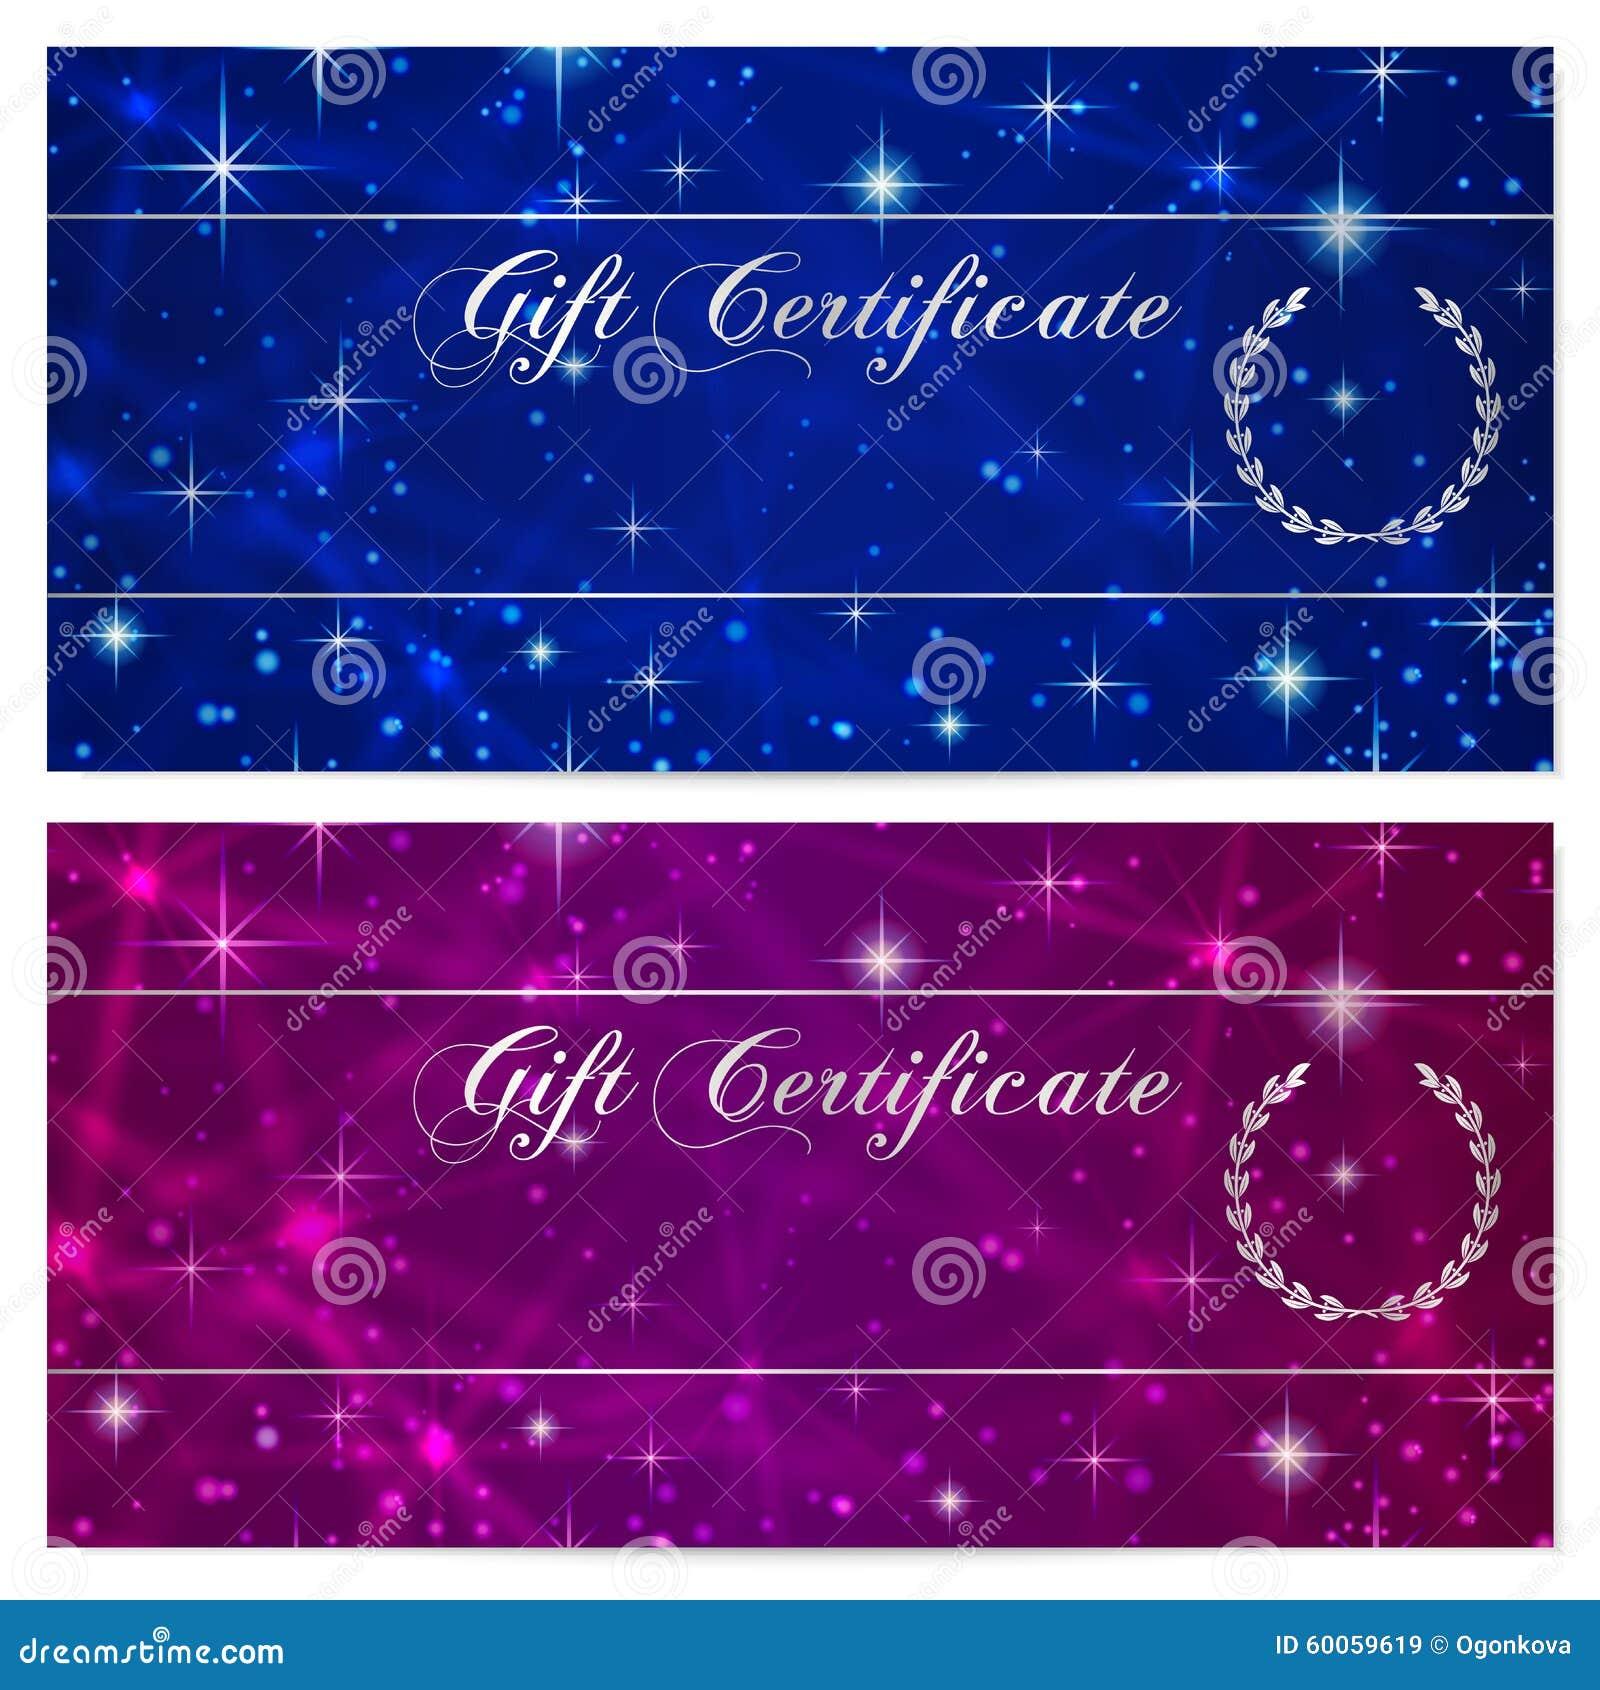 The night sky coupon code